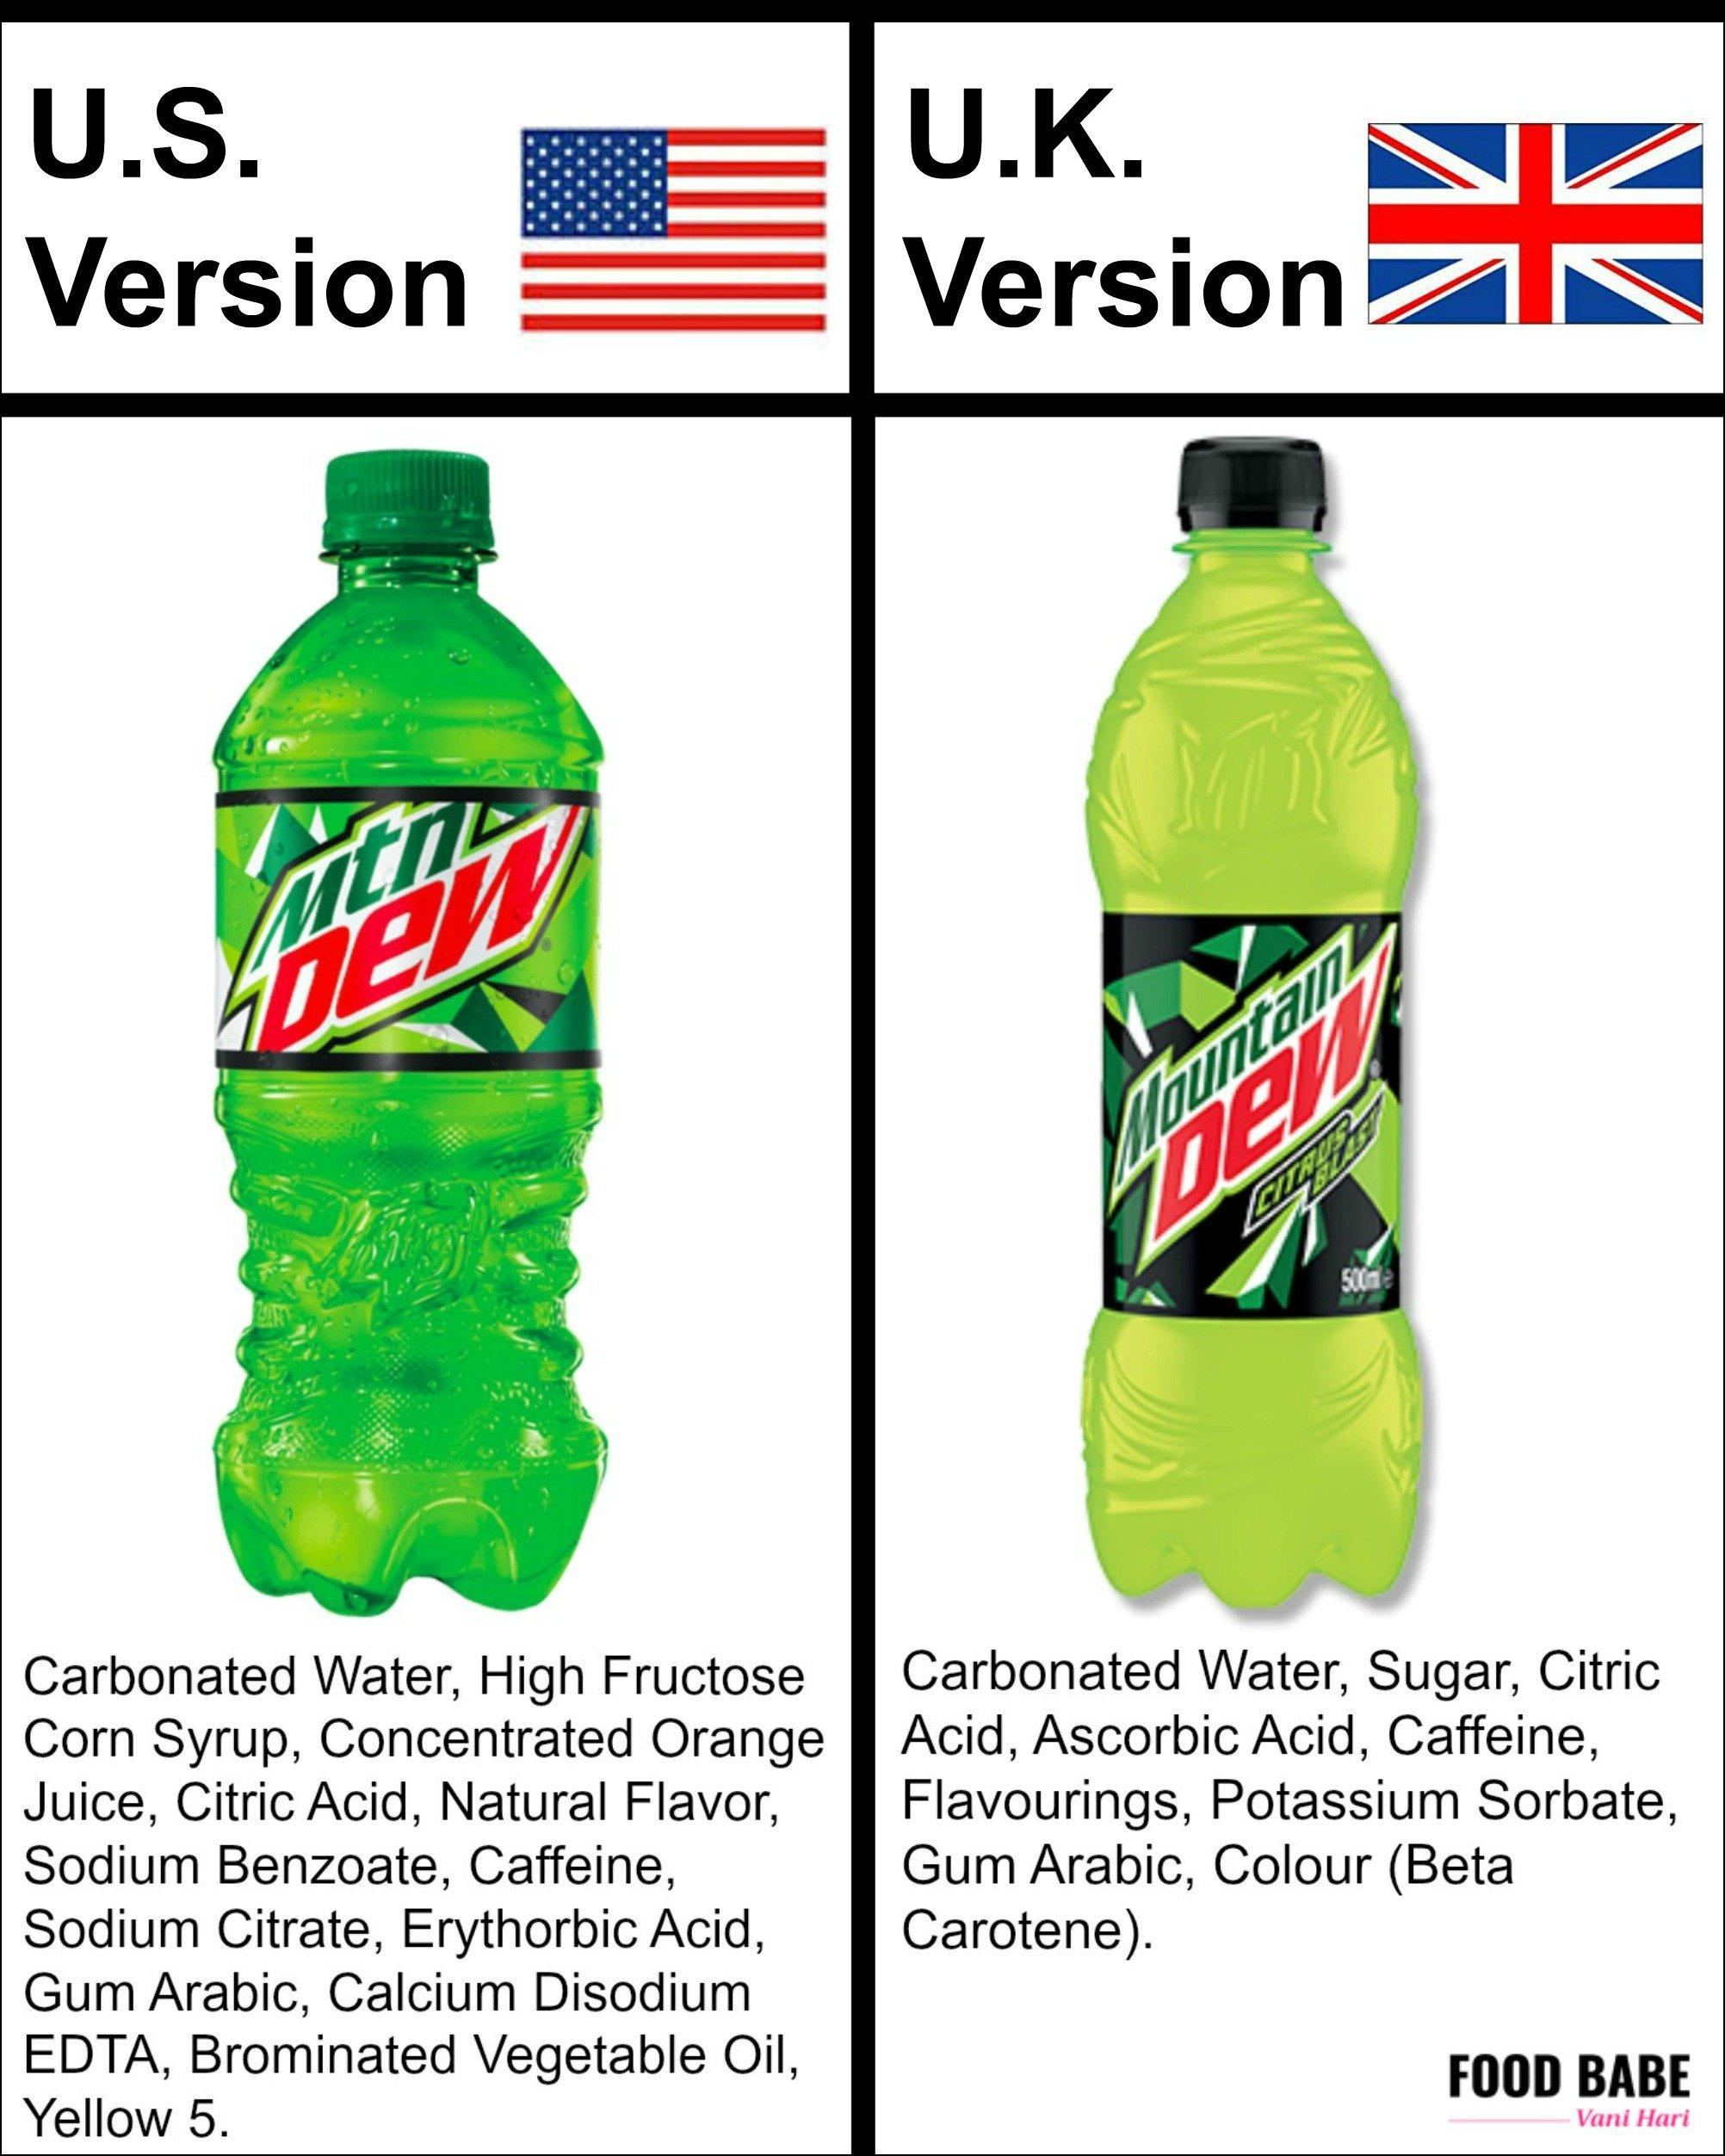 food in america compared